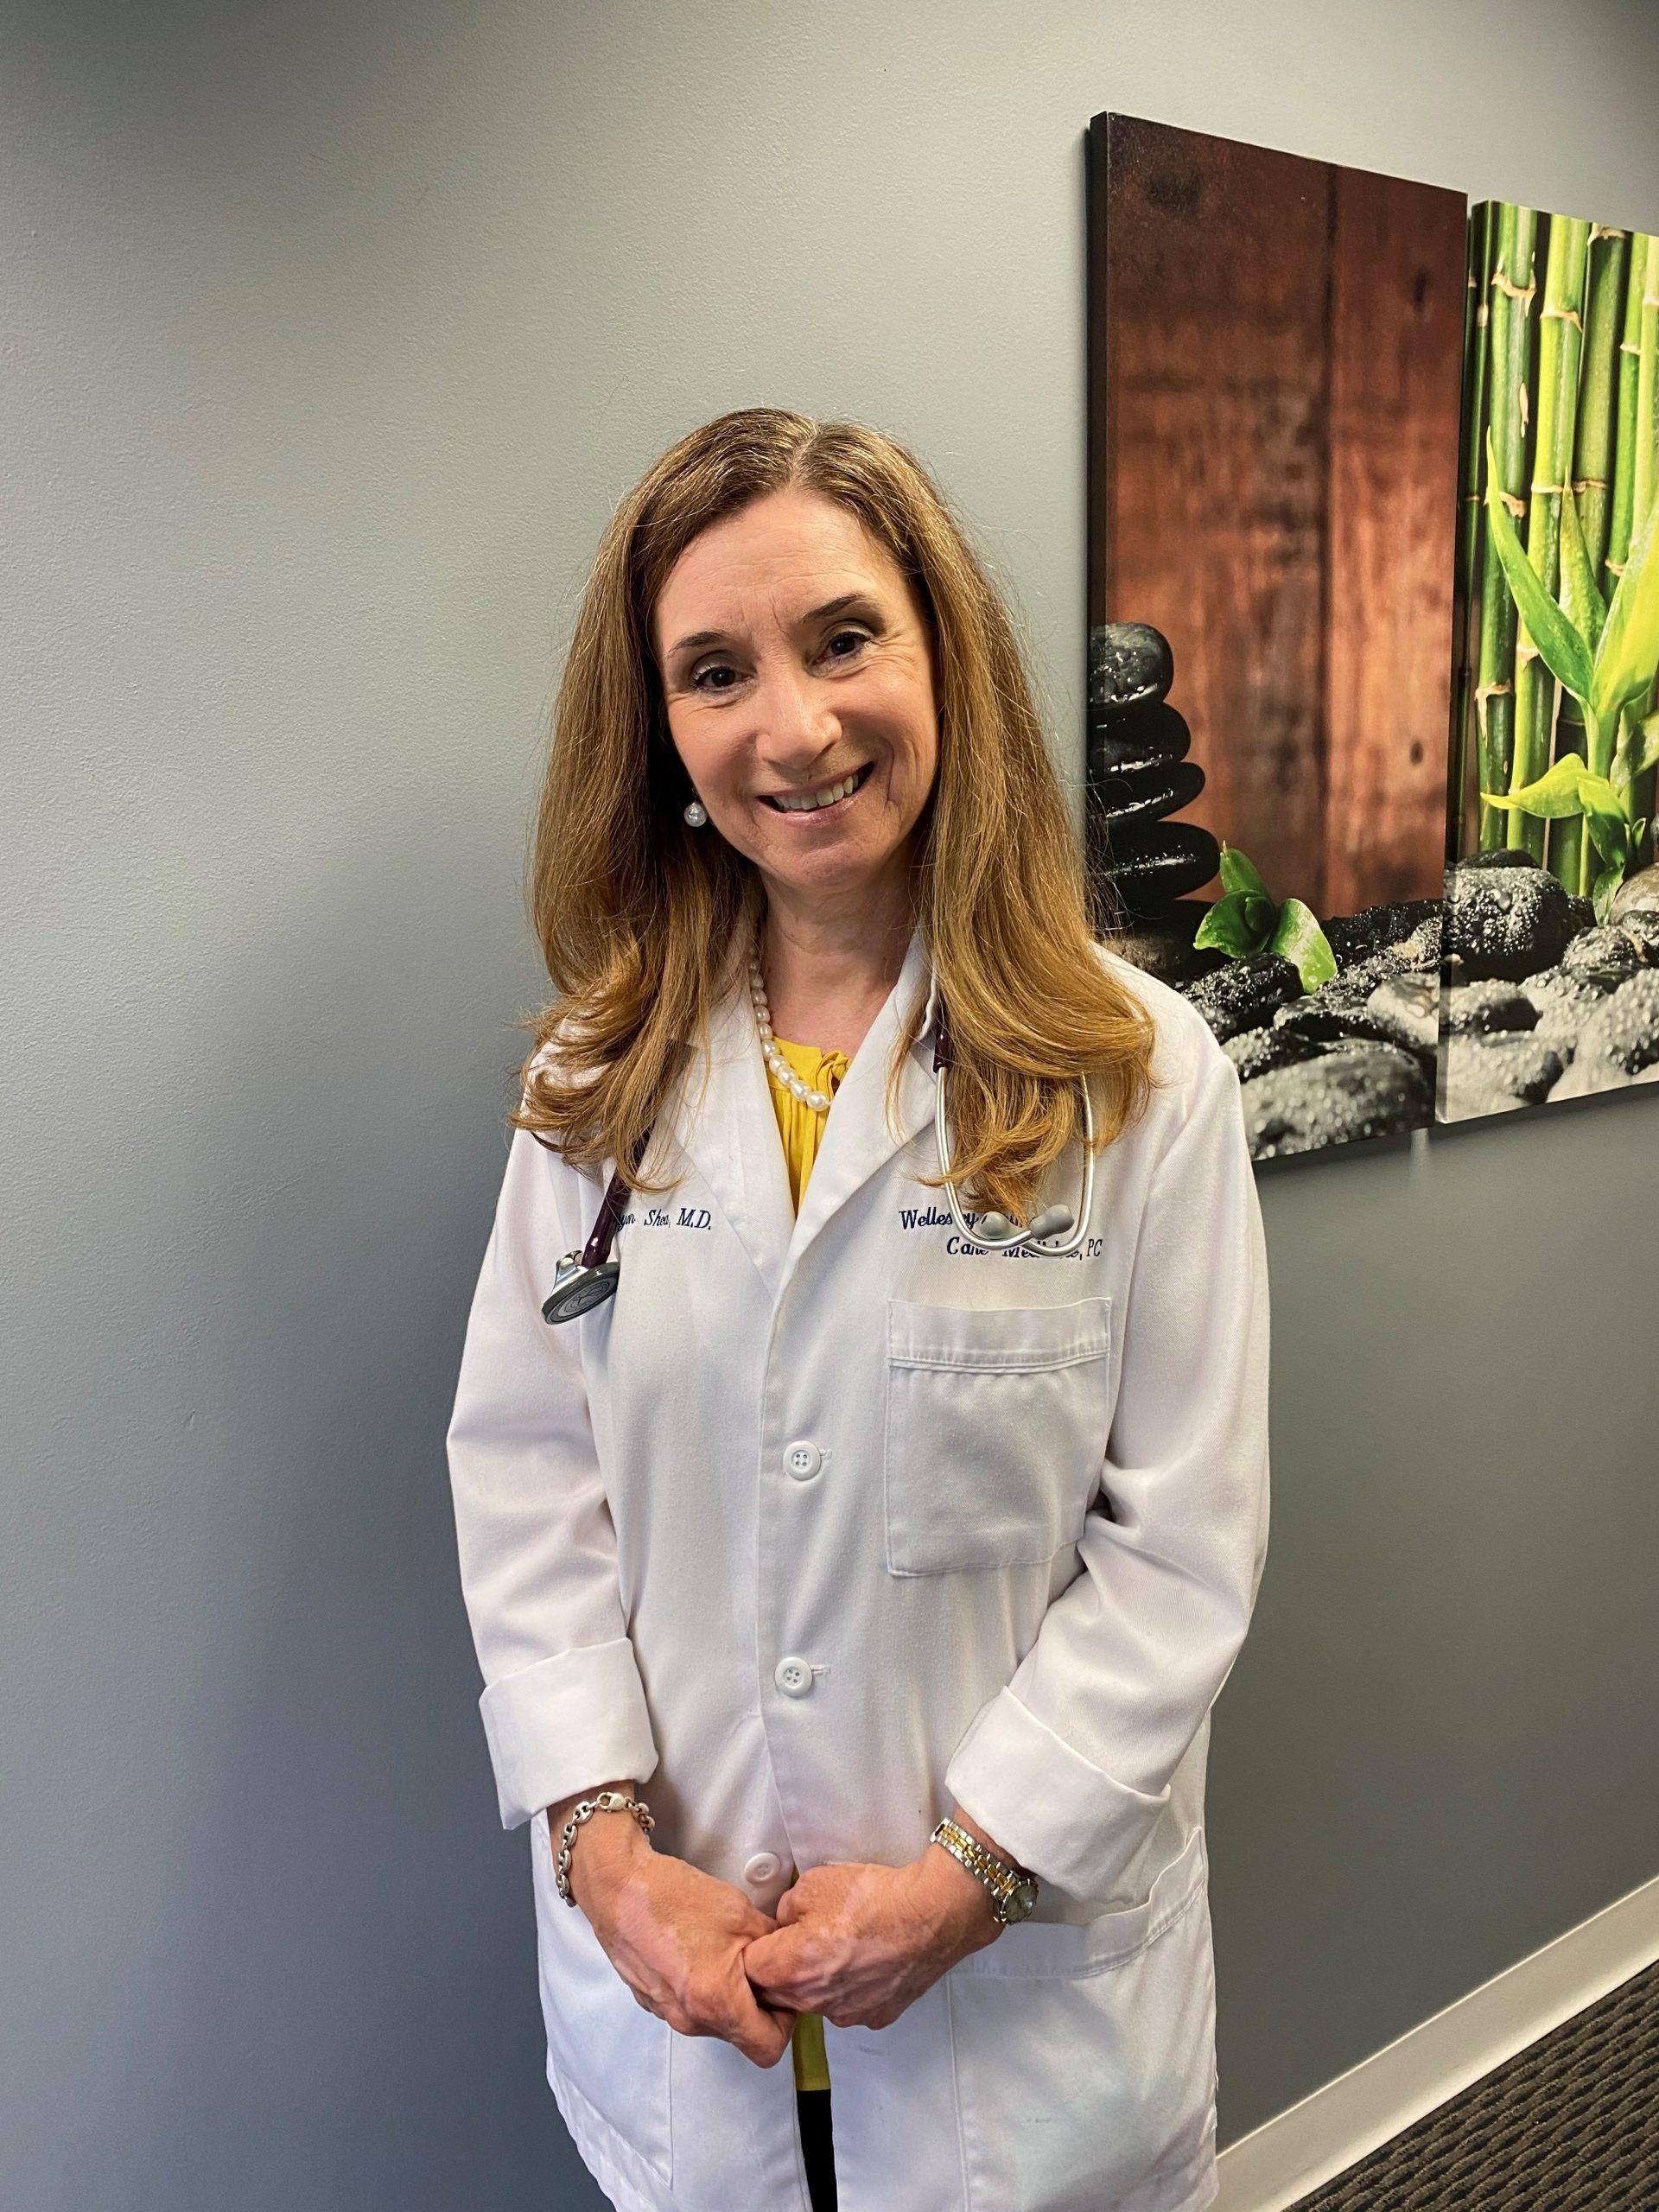 Dr. Maryann Shea, Concierge Medicine